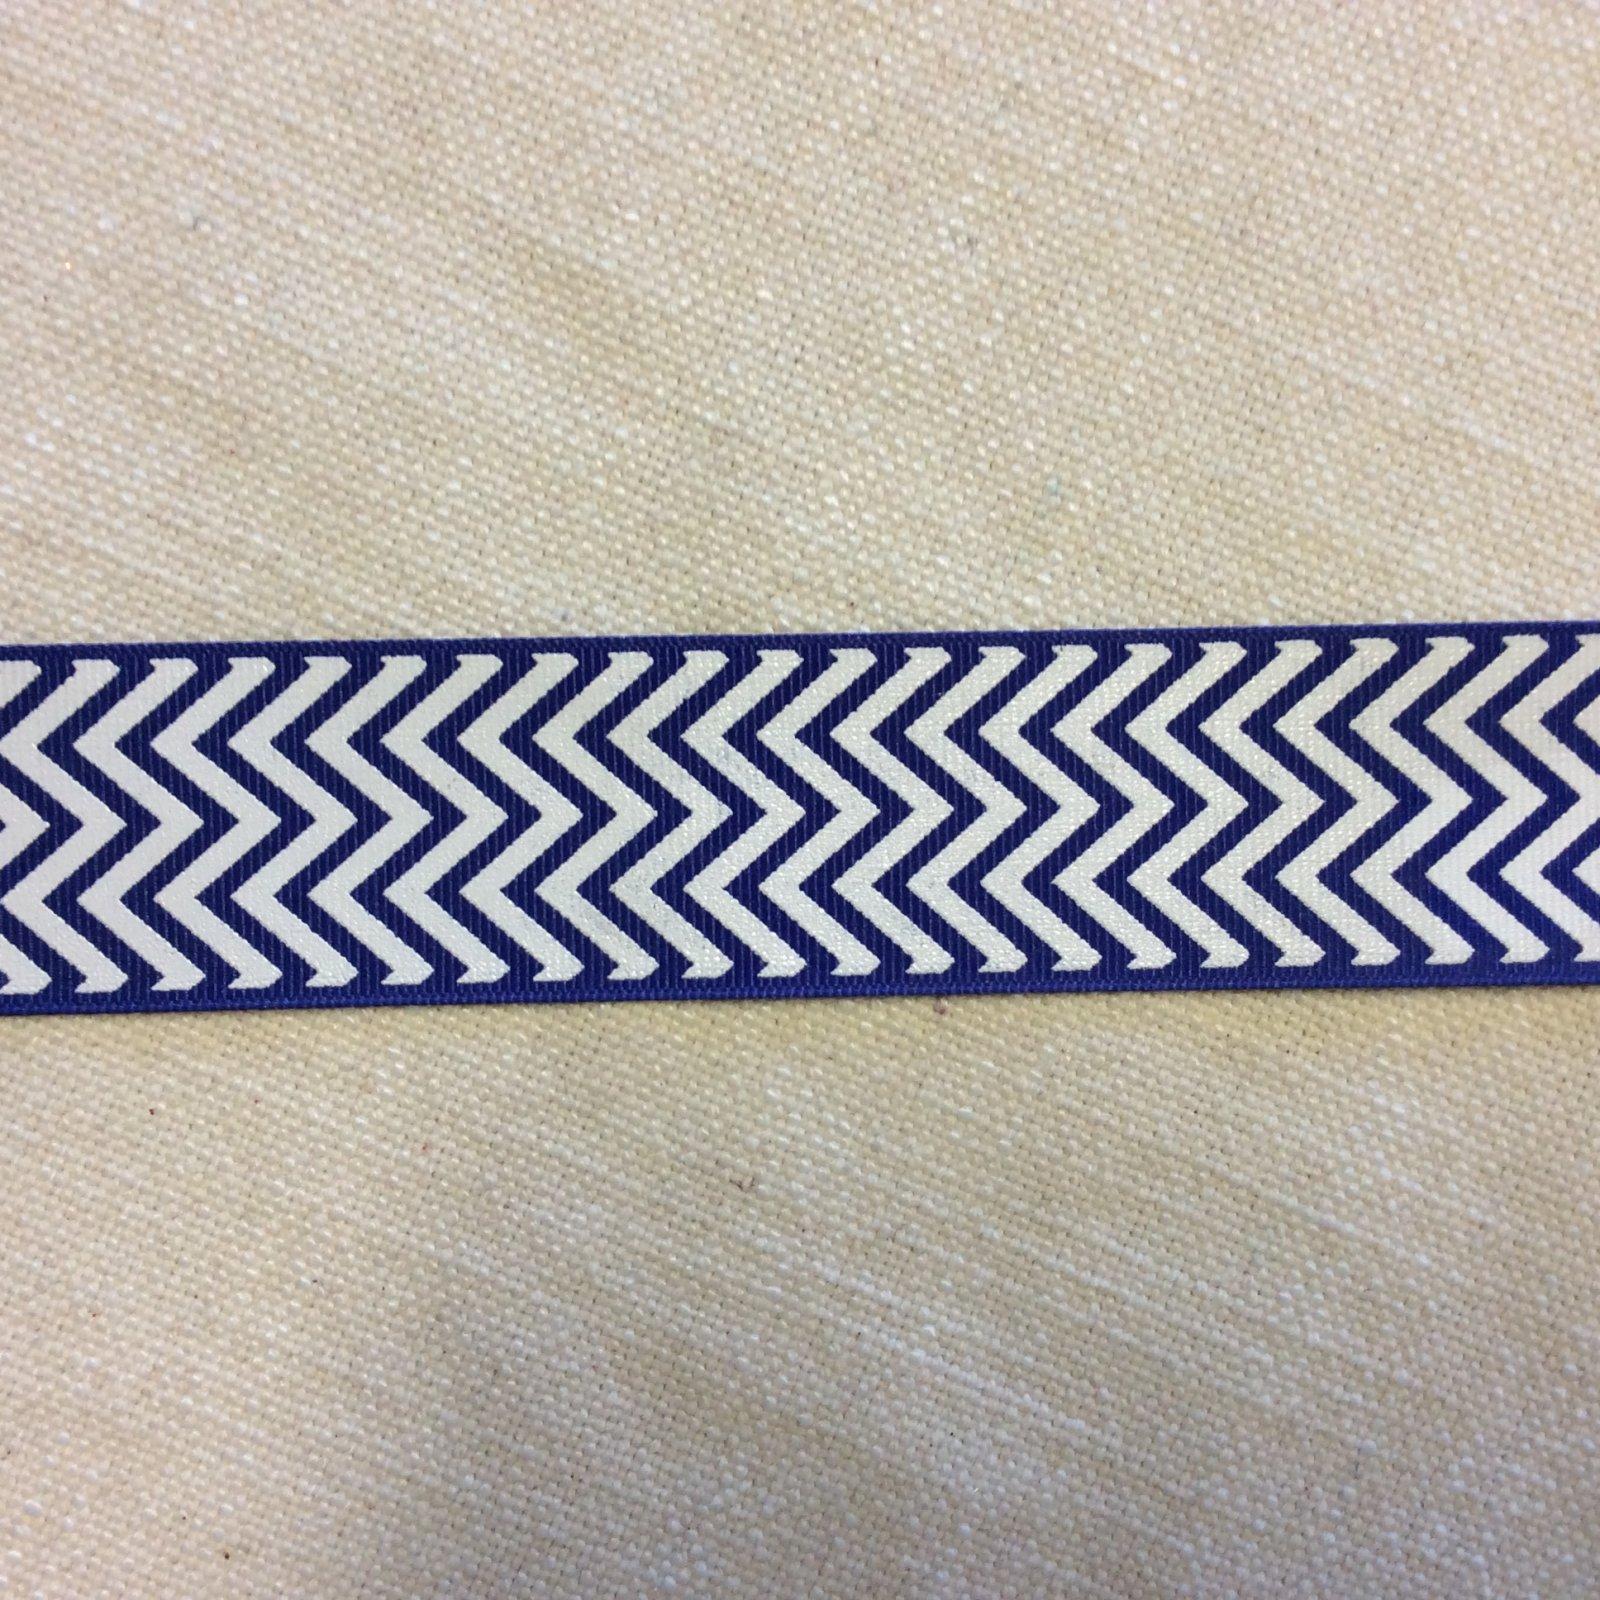 Printed Grosgrain Ribbon Blue and White Chevron 1.5 Wide Trim RIB1128